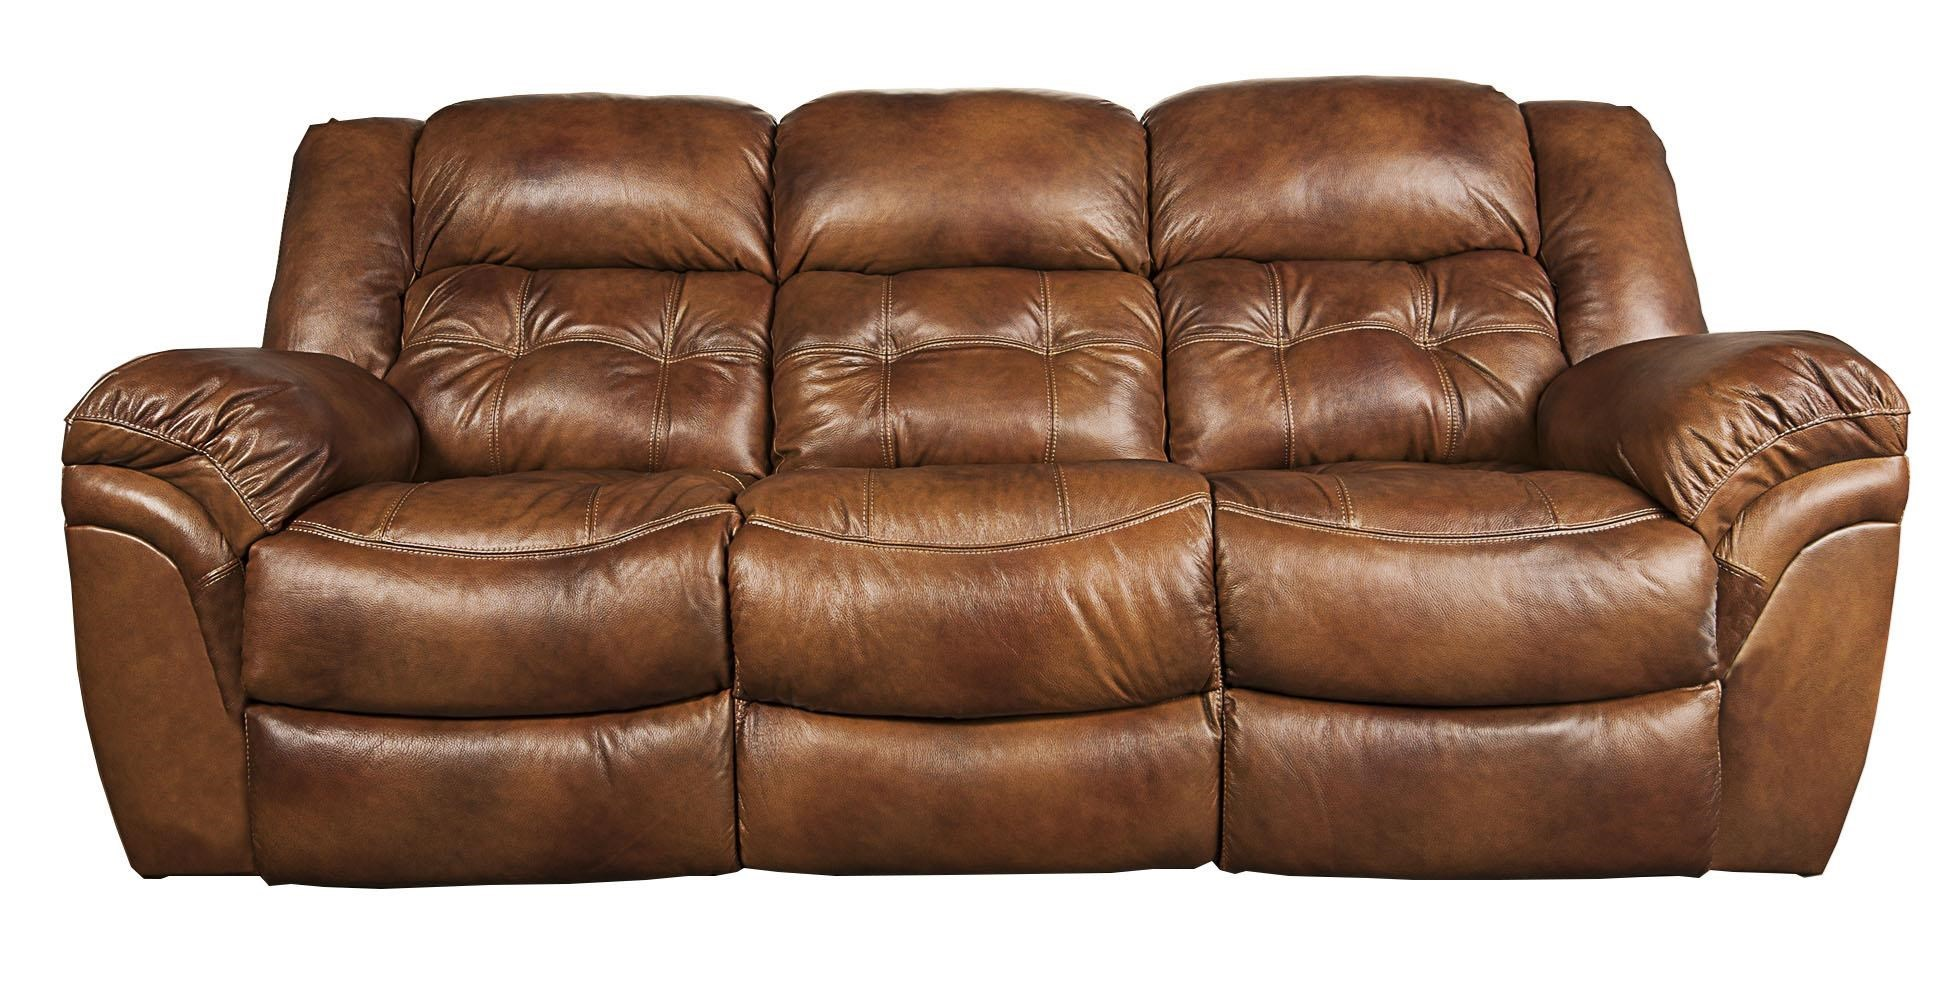 Morris Home Furnishings ElijahElijah Power Reclining Plush Sofa ...